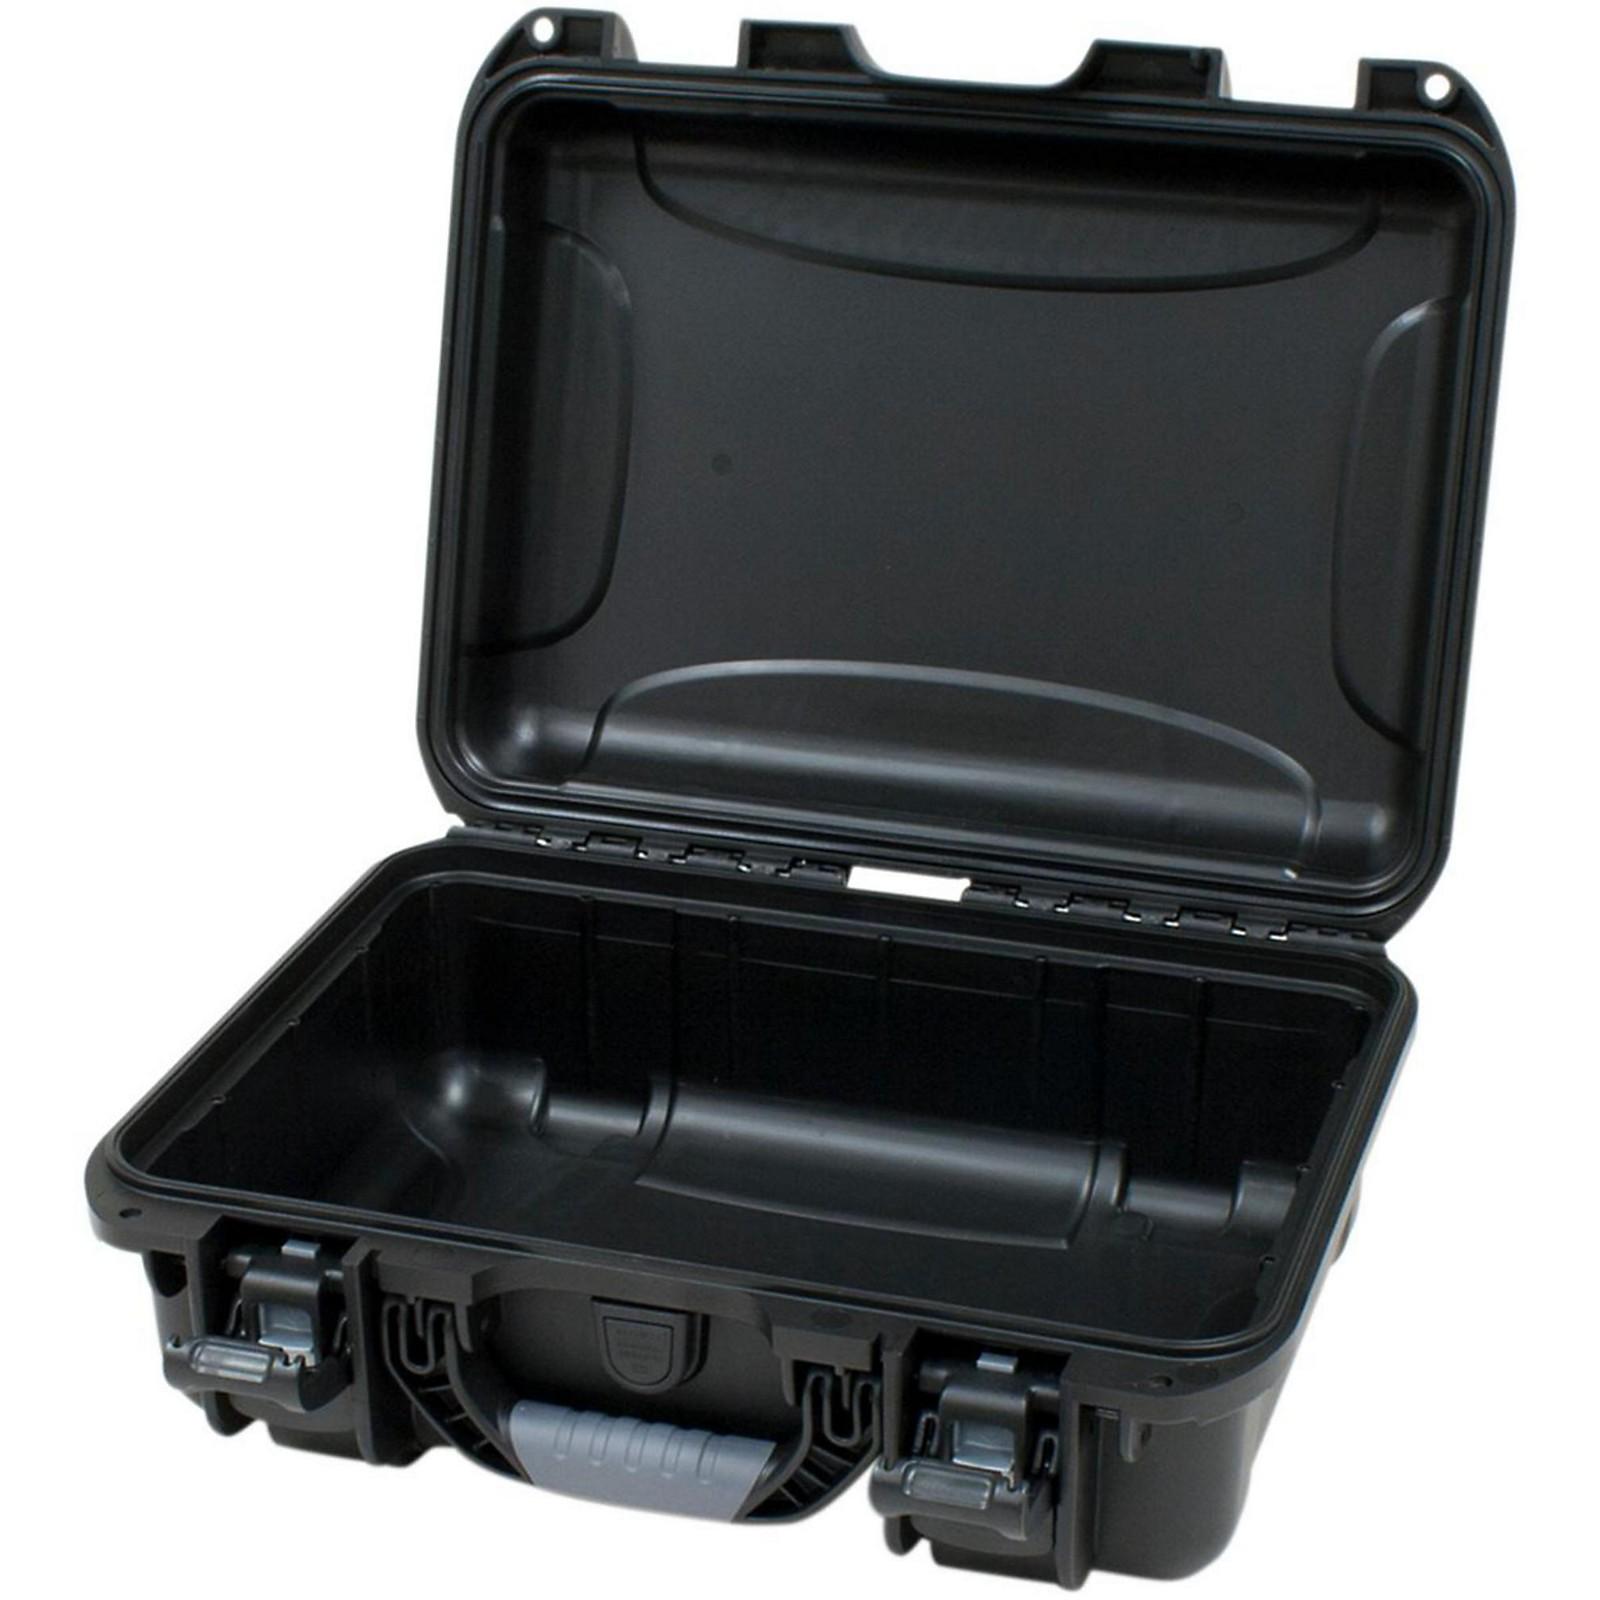 Gator GU-1510-06-WPNF Waterproof Injection Molded Case